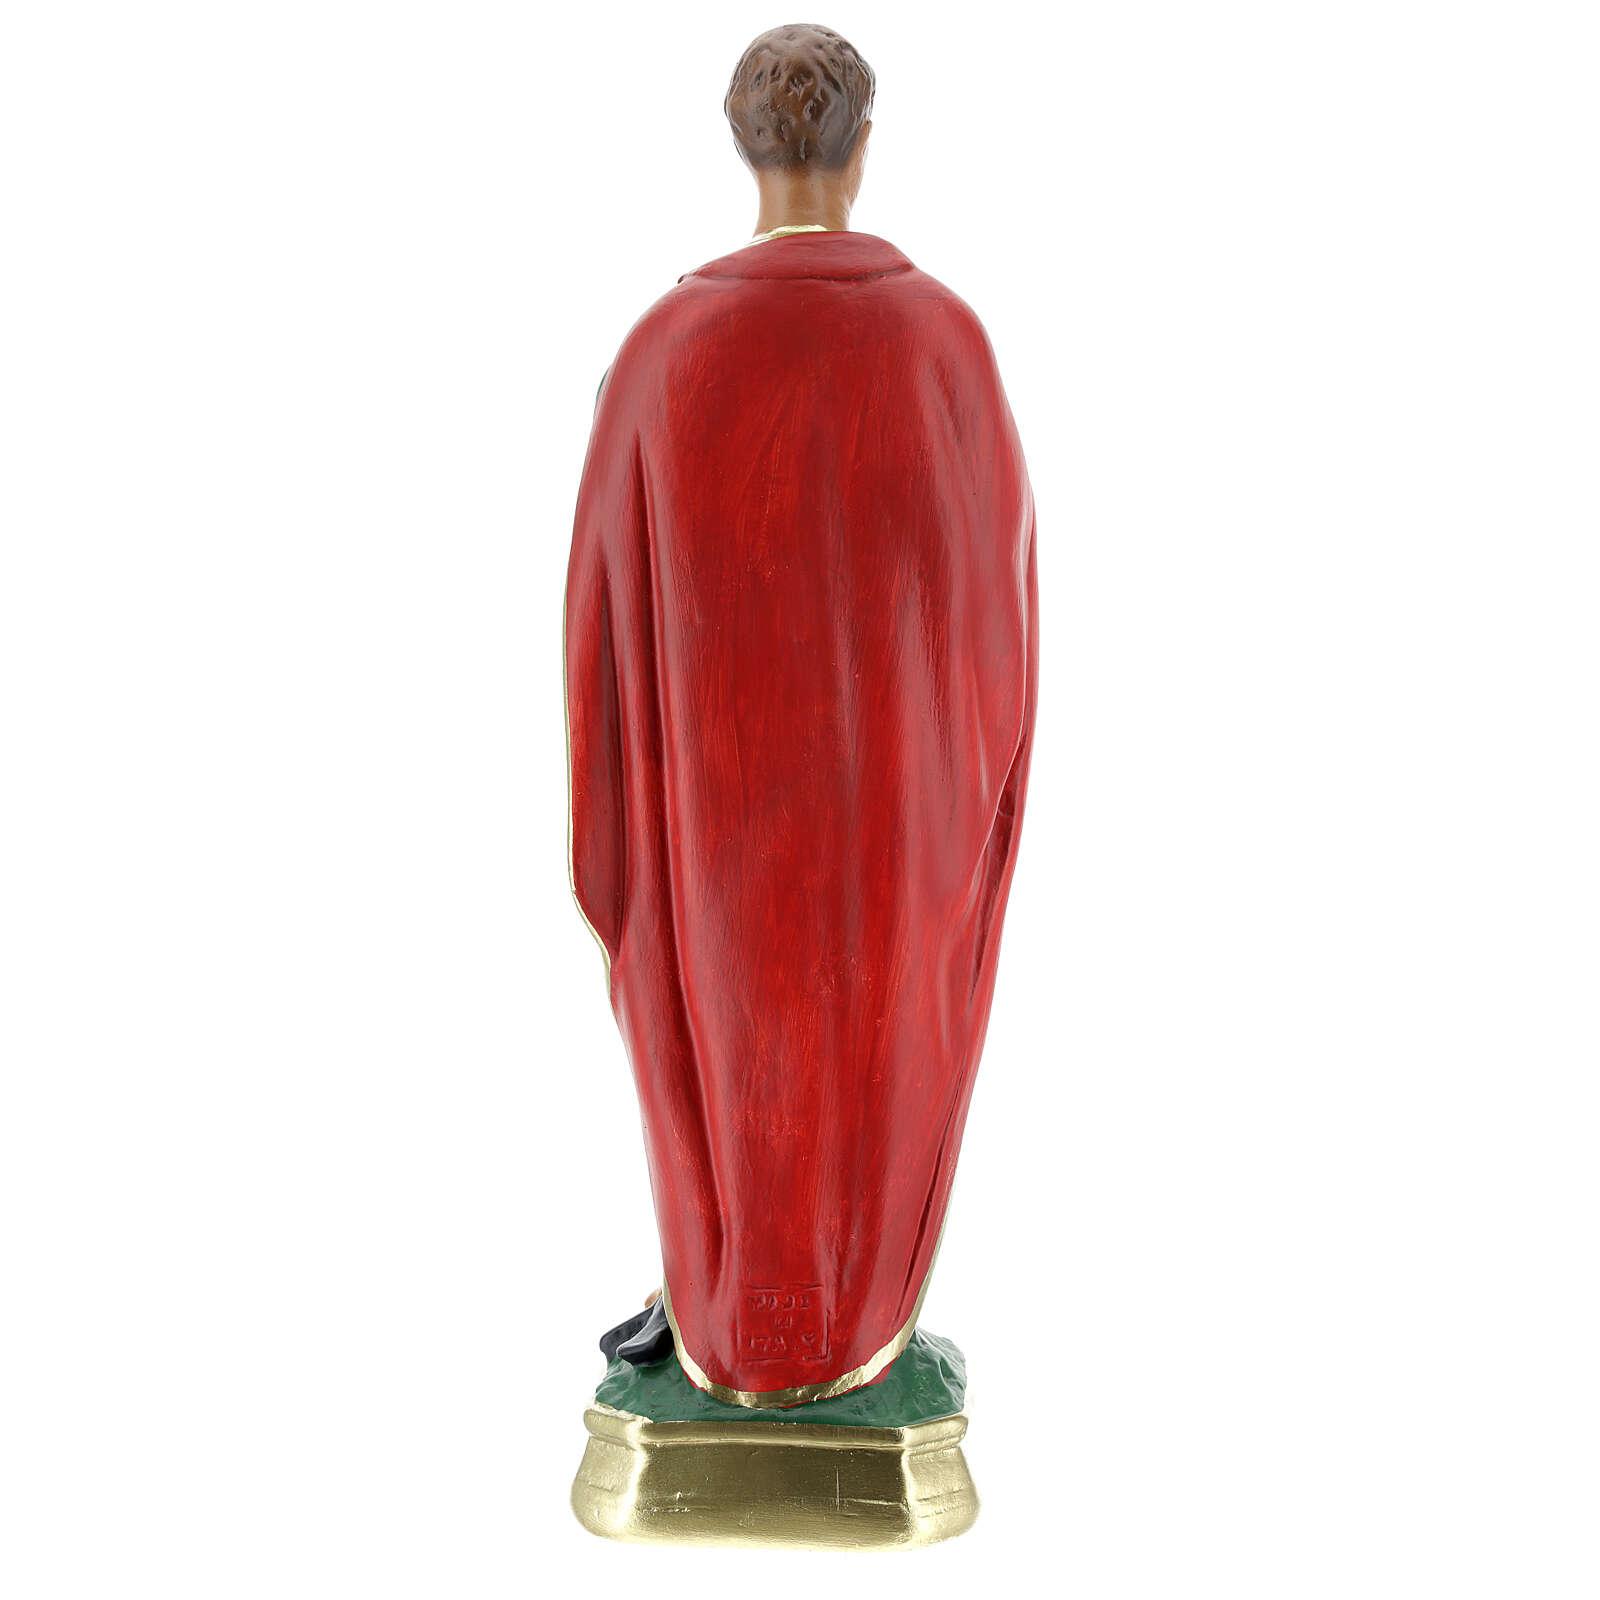 St Expedite statue, 30 cm hand painted plaster Arte Barsanti 4